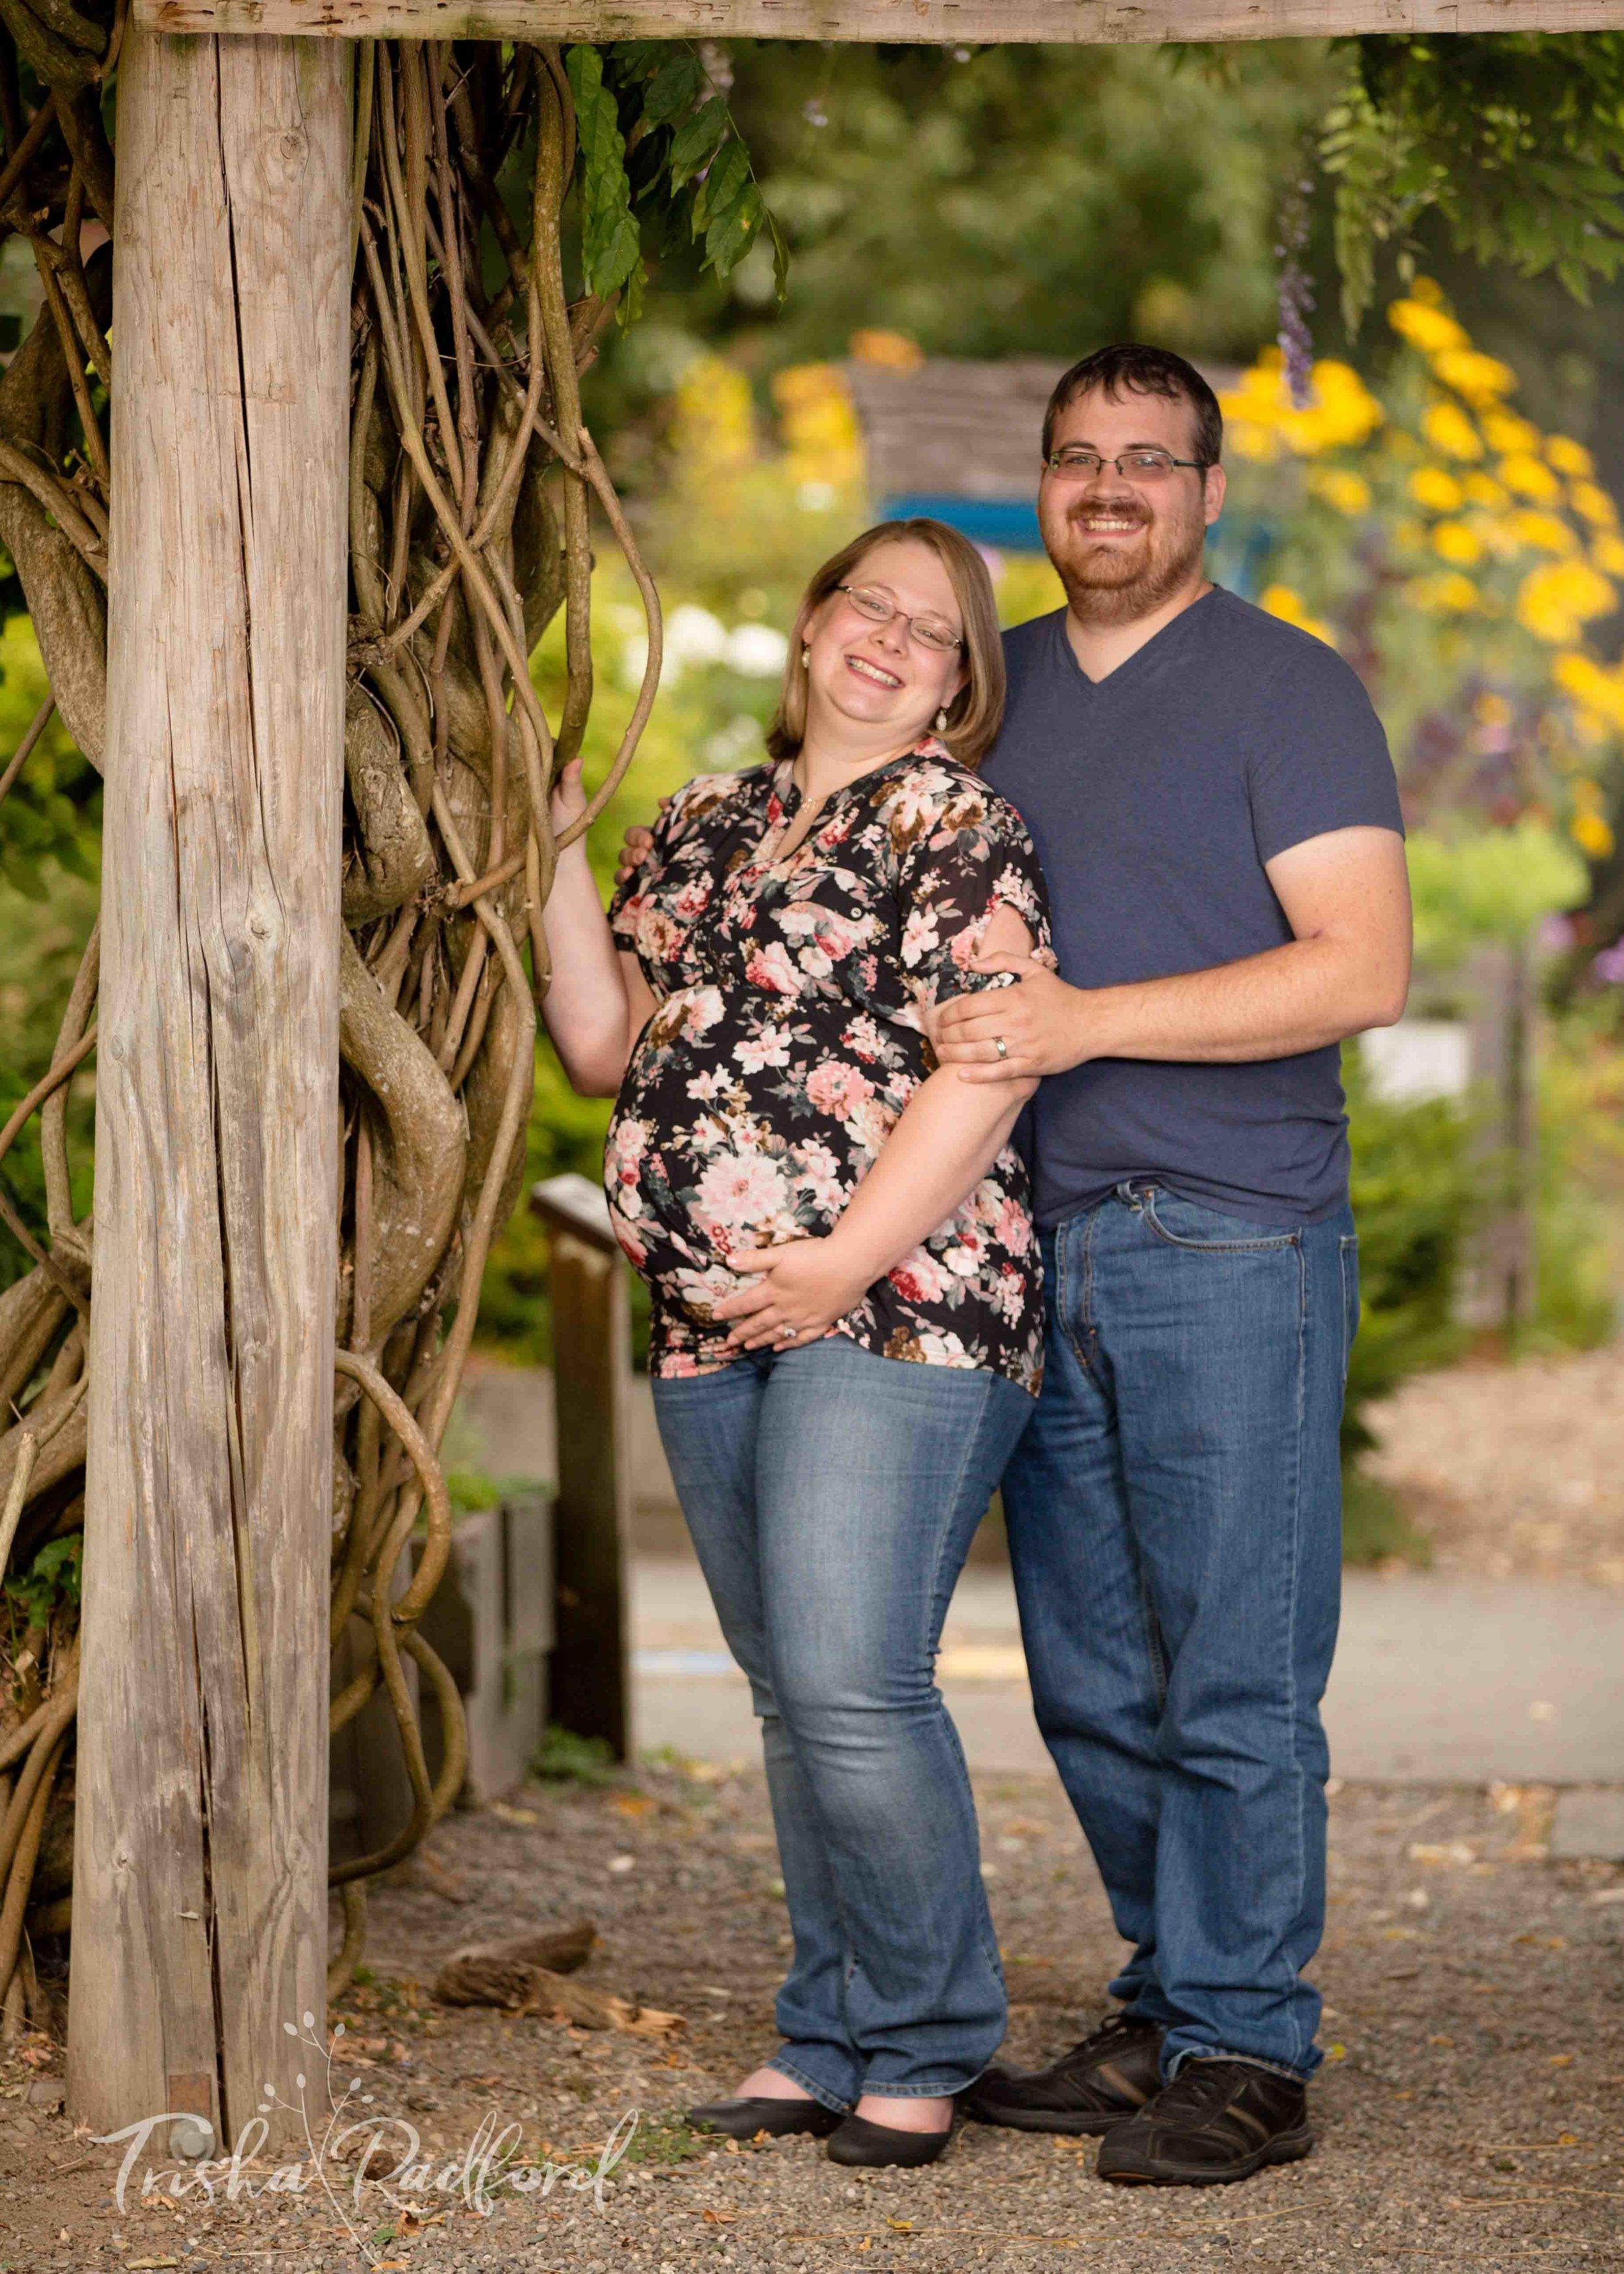 Snohomish County Photographer   Maternity Photoshoot   Jennings Park, Marysville WA